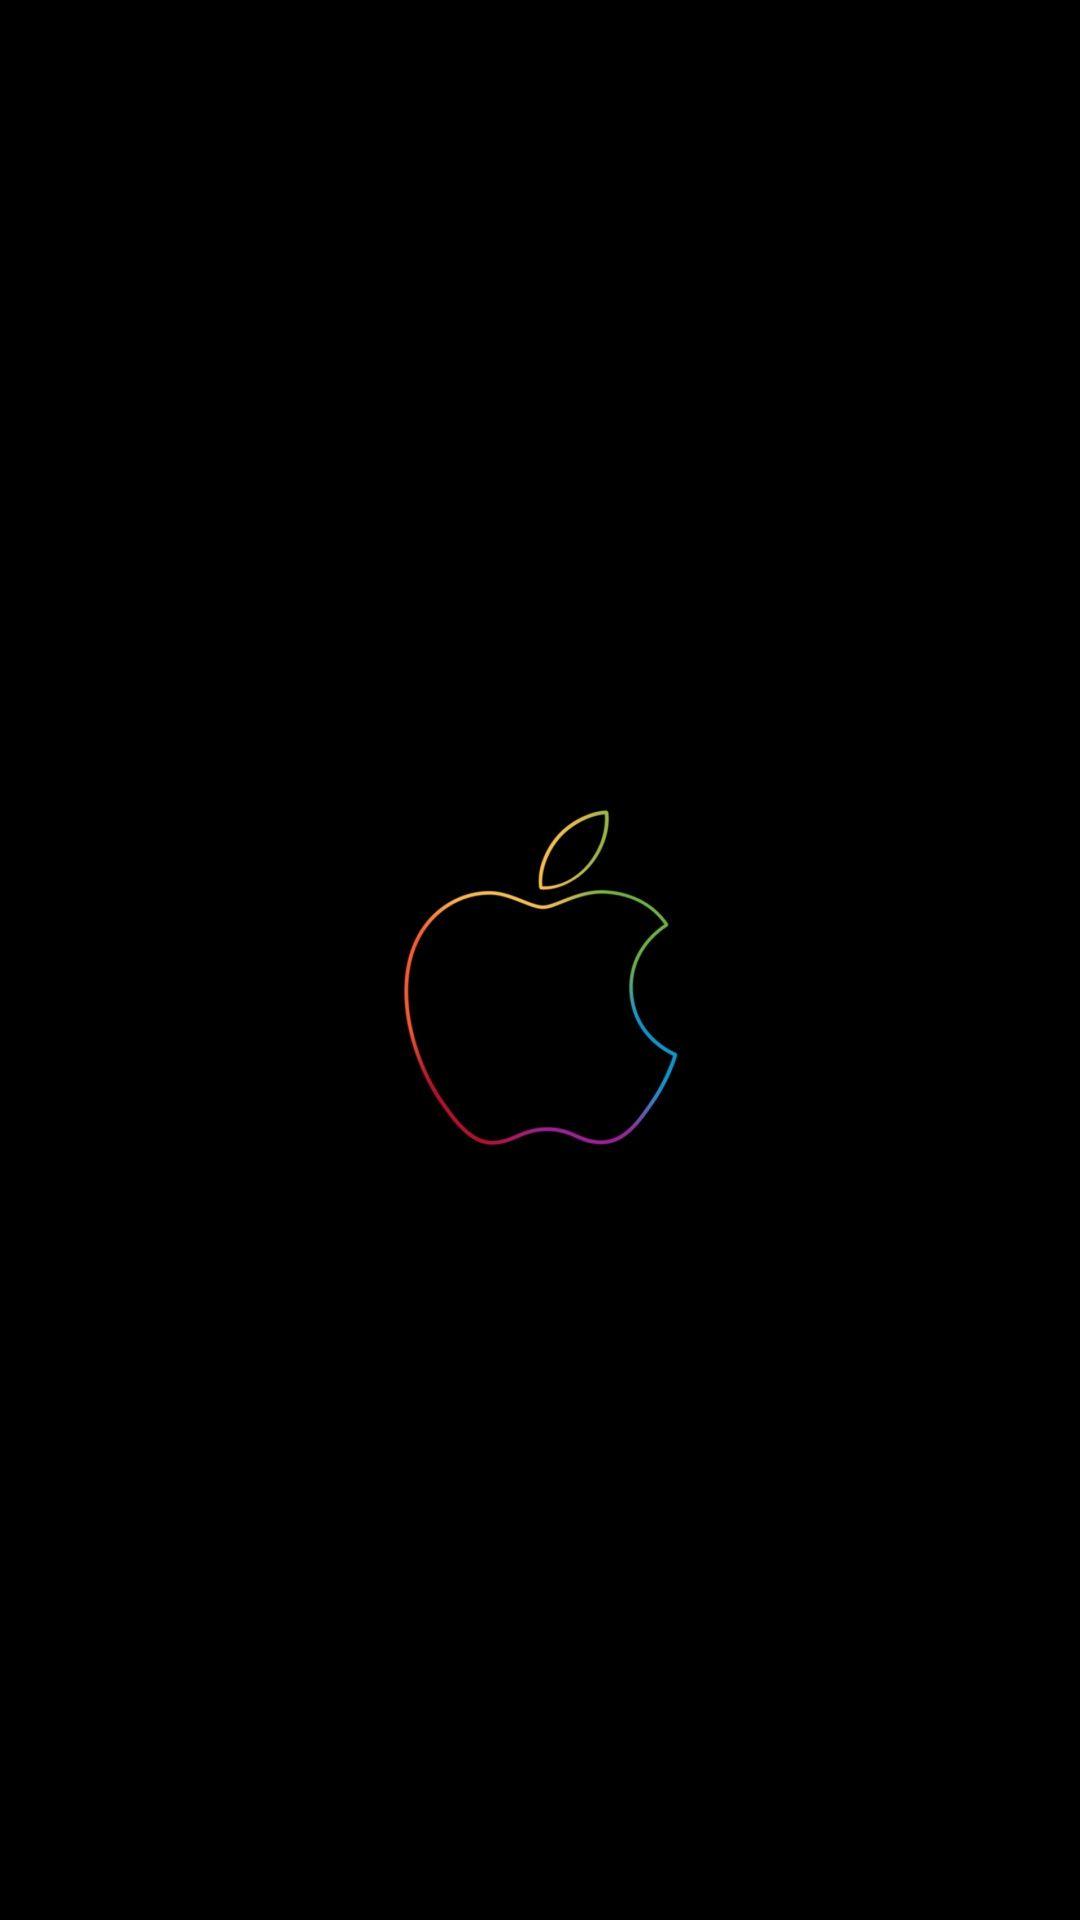 Apple Colorful Logo Minimal 1080x19 Wallpaper Apple Logo Wallpaper Iphone Apple Logo Wallpaper Apple Wallpaper Iphone